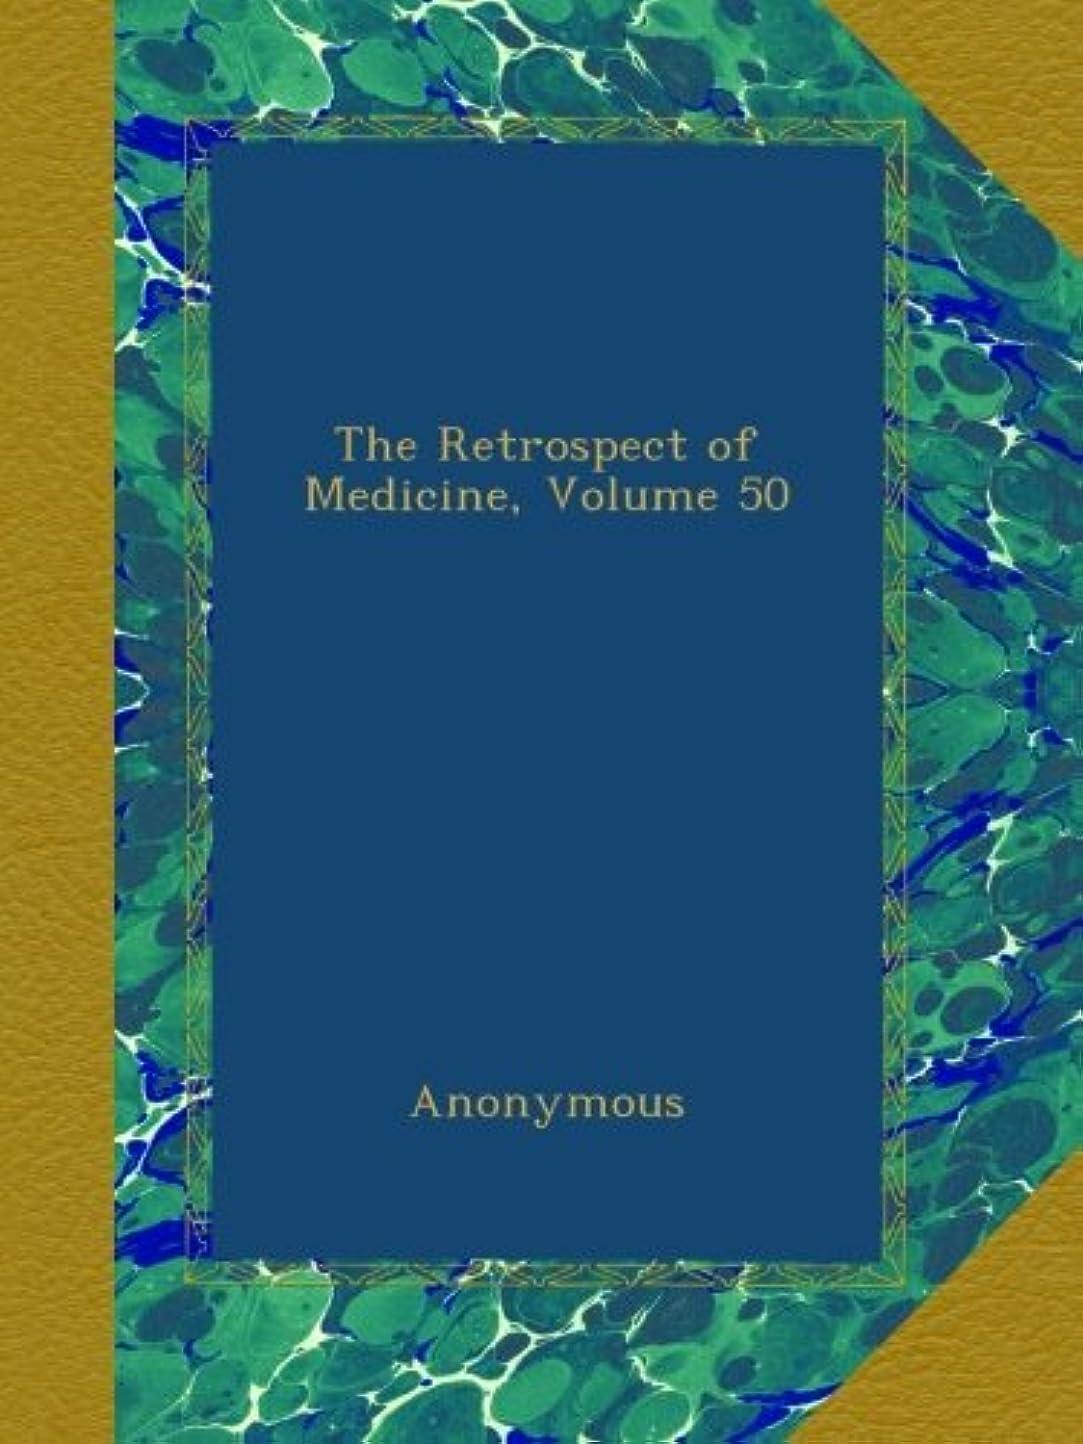 The Retrospect of Medicine, Volume 50